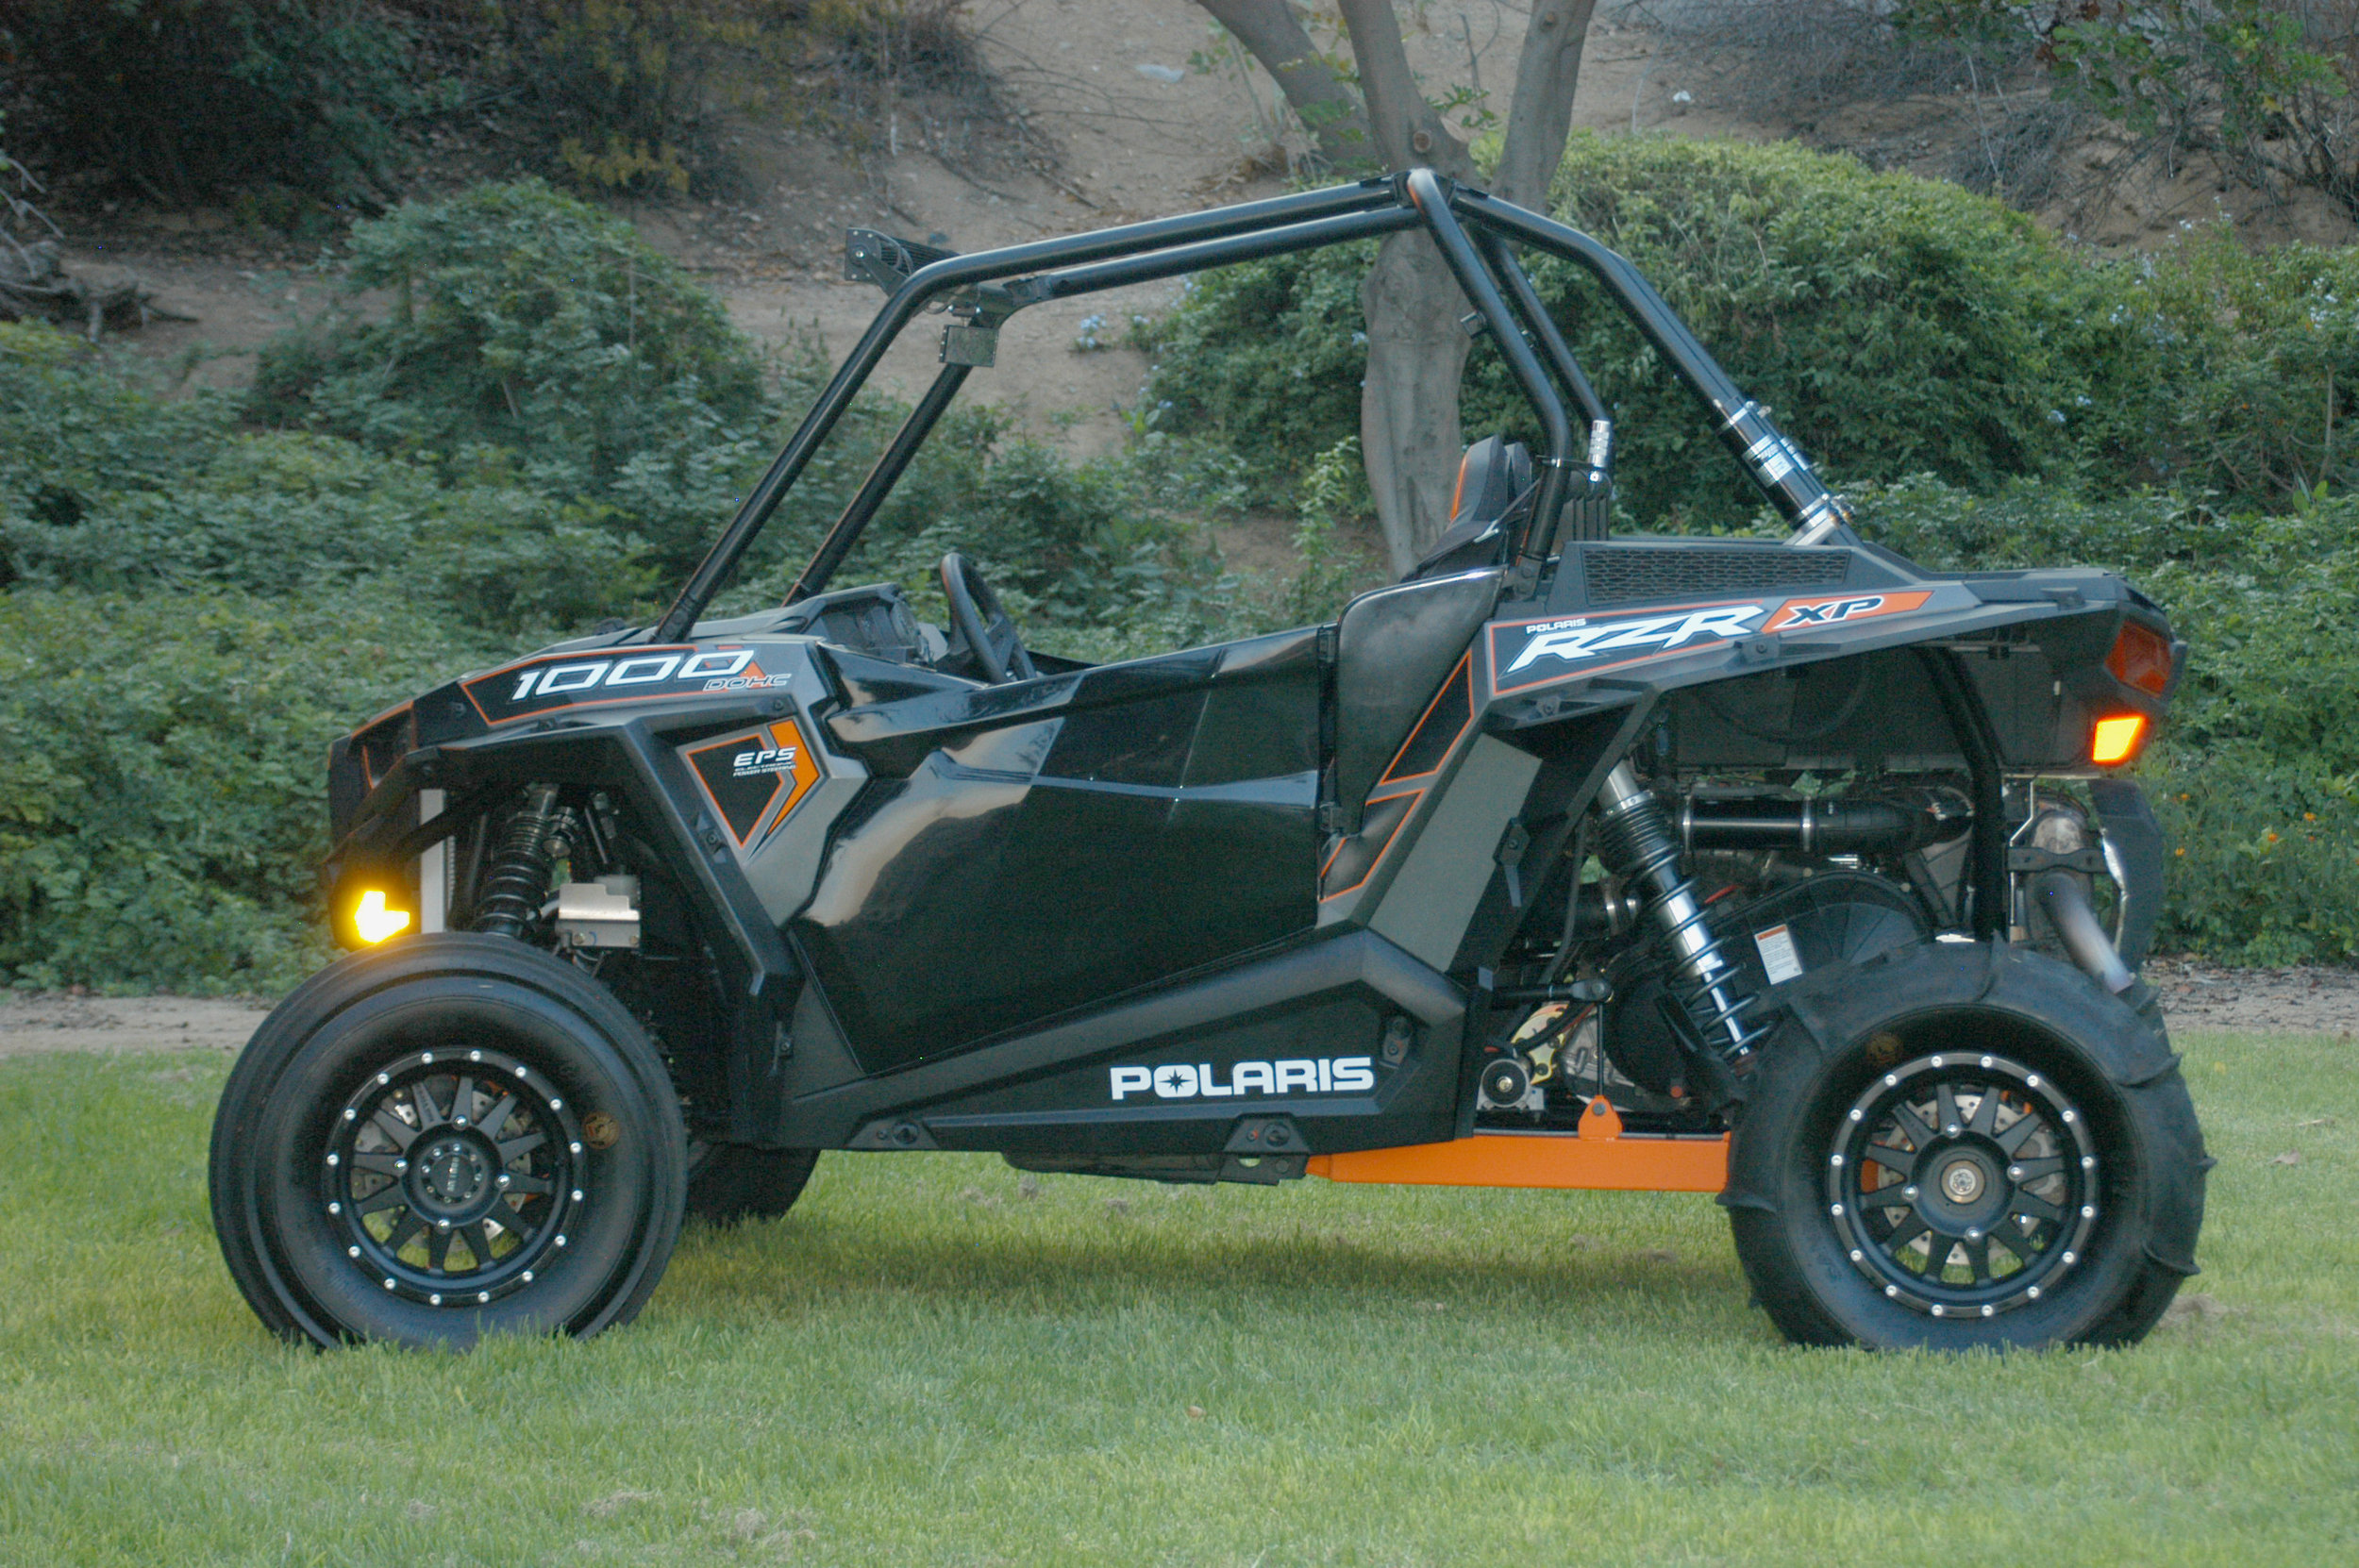 Polaris RZR XP1000 with custom doors from Lavey Craft.jpg